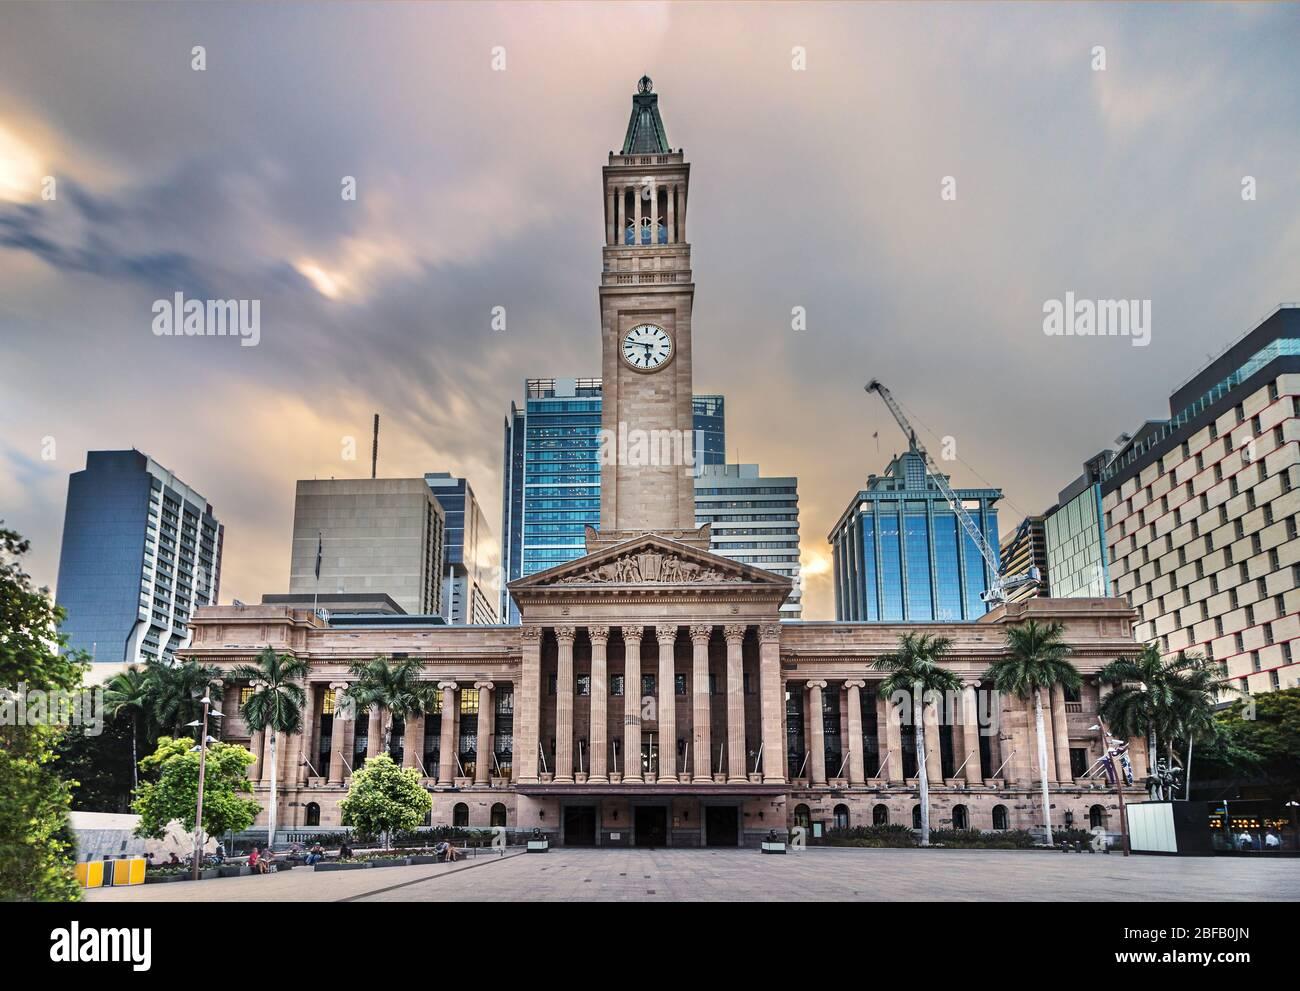 Brisbane City Council located adjacent to King George Square, Australia Stock Photo